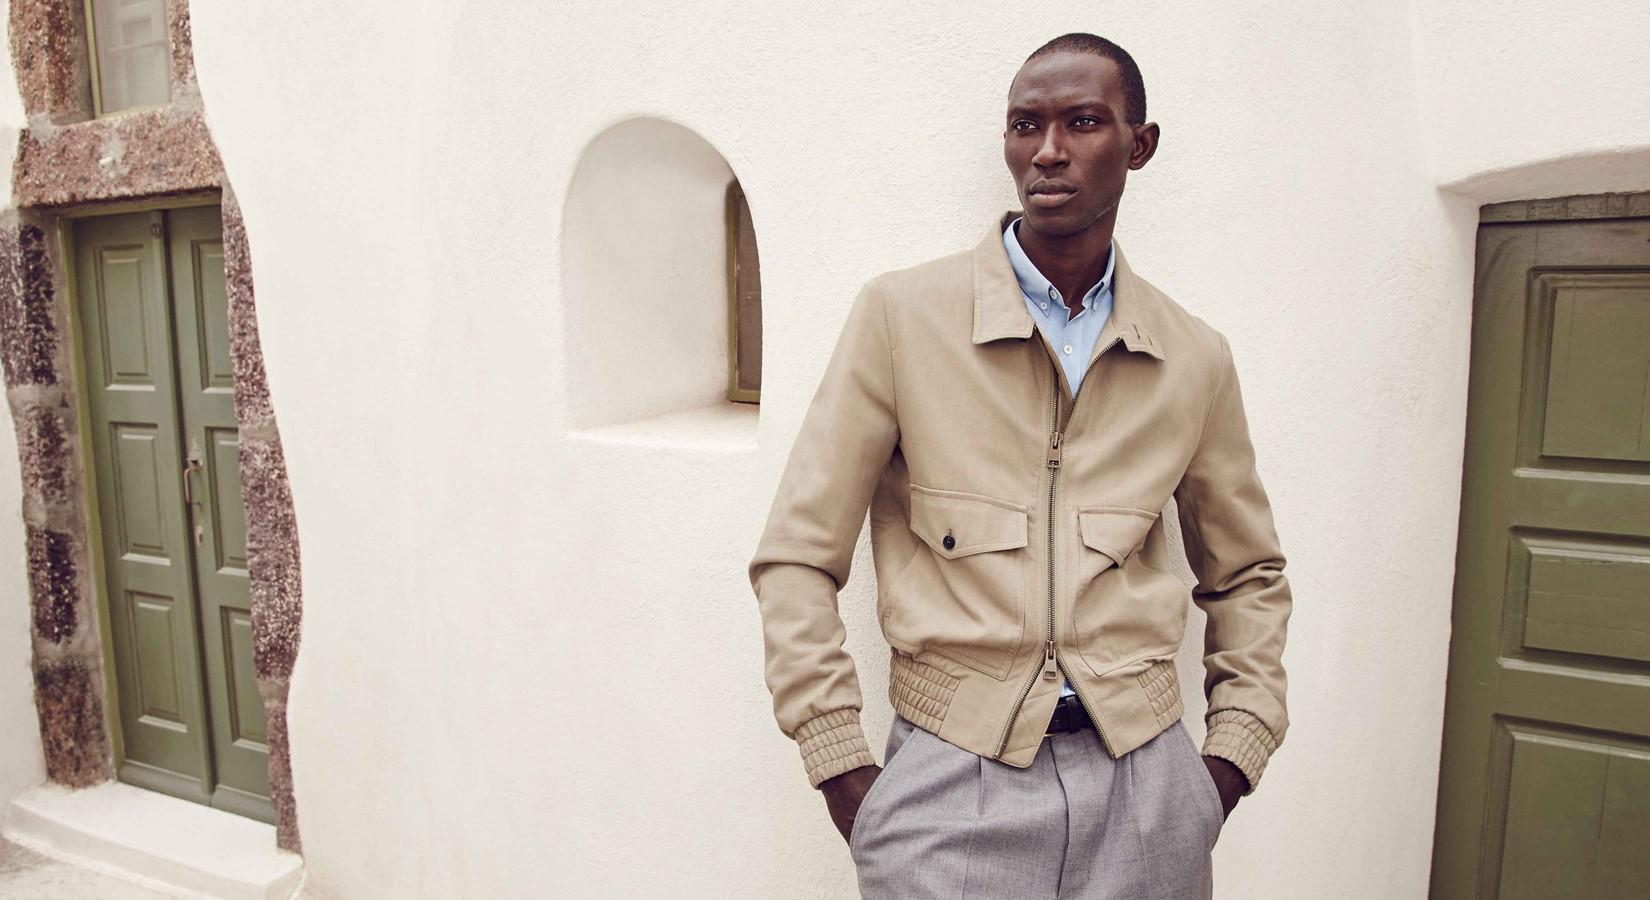 Holt Renfrew Spring 2016: Armando Cabral Dons Designer Styles